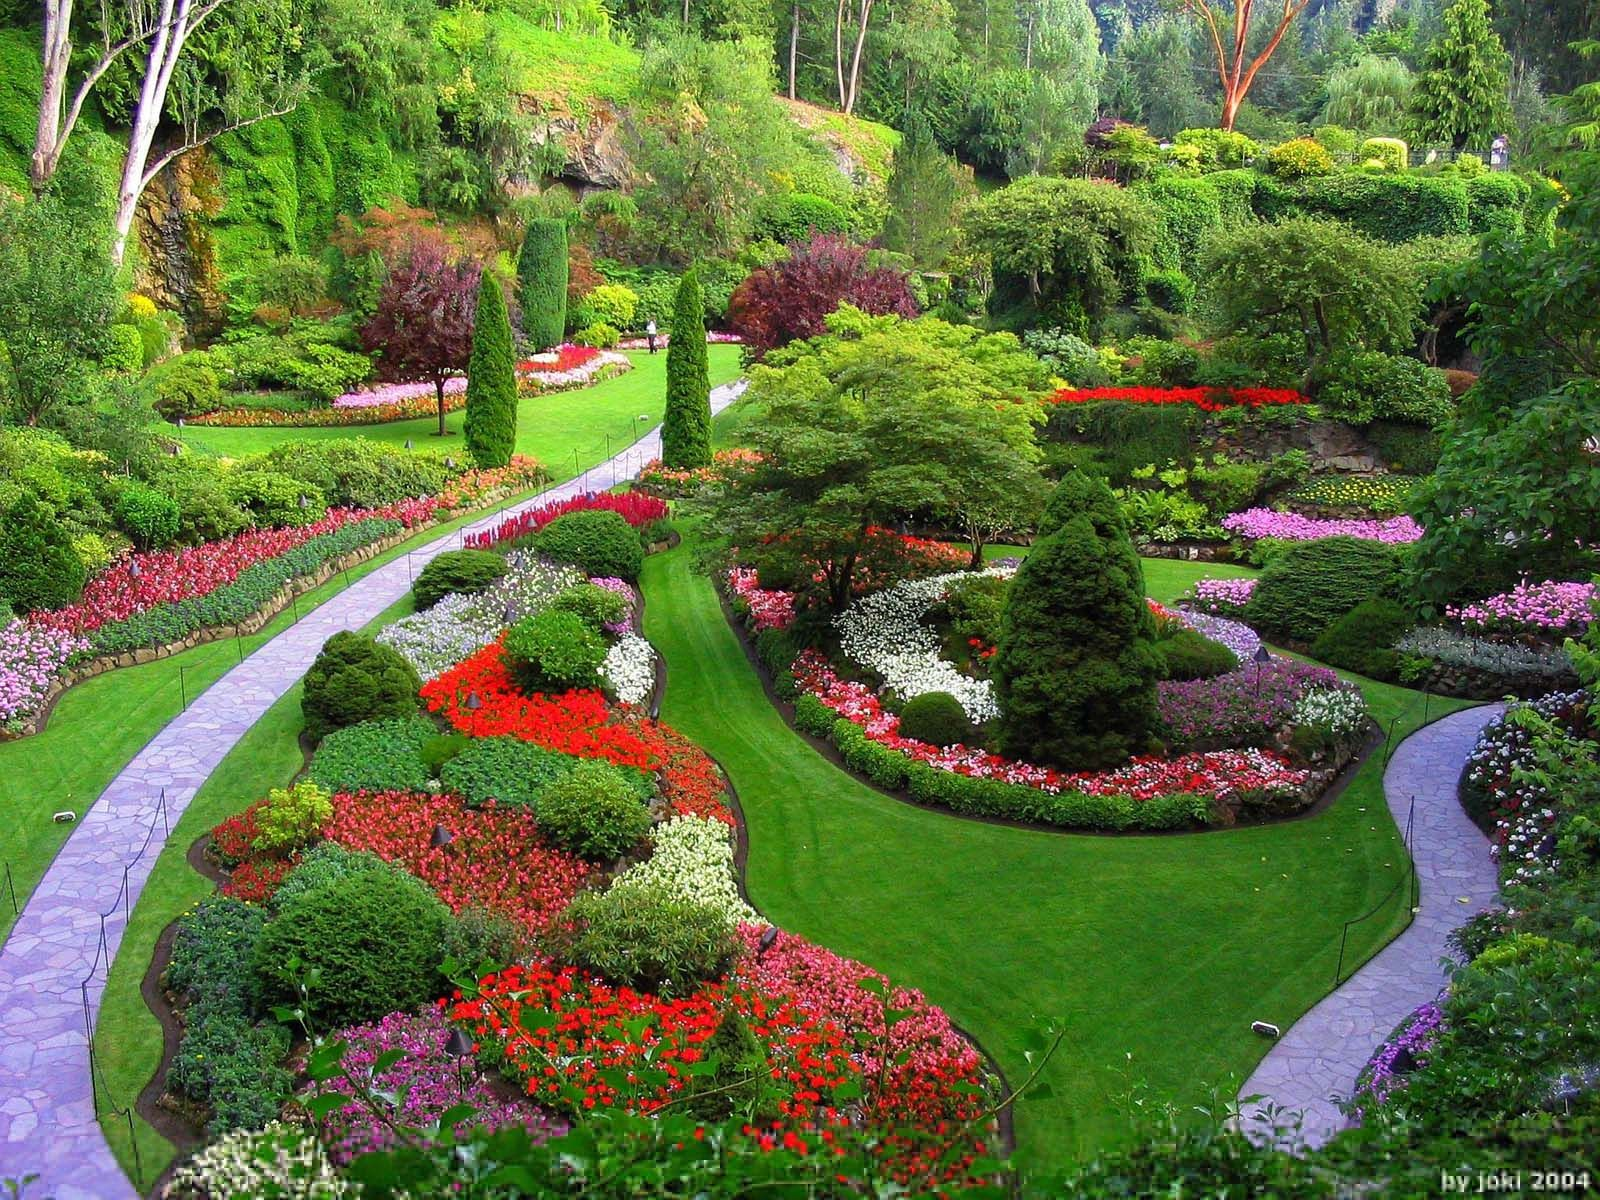 20 Fascinating Backyard Garden Designs Top Dreamer Best Garden Design Best Garden Ideas Diy Most Beautiful Gardens Butchart Gardens Garden Landscape Design